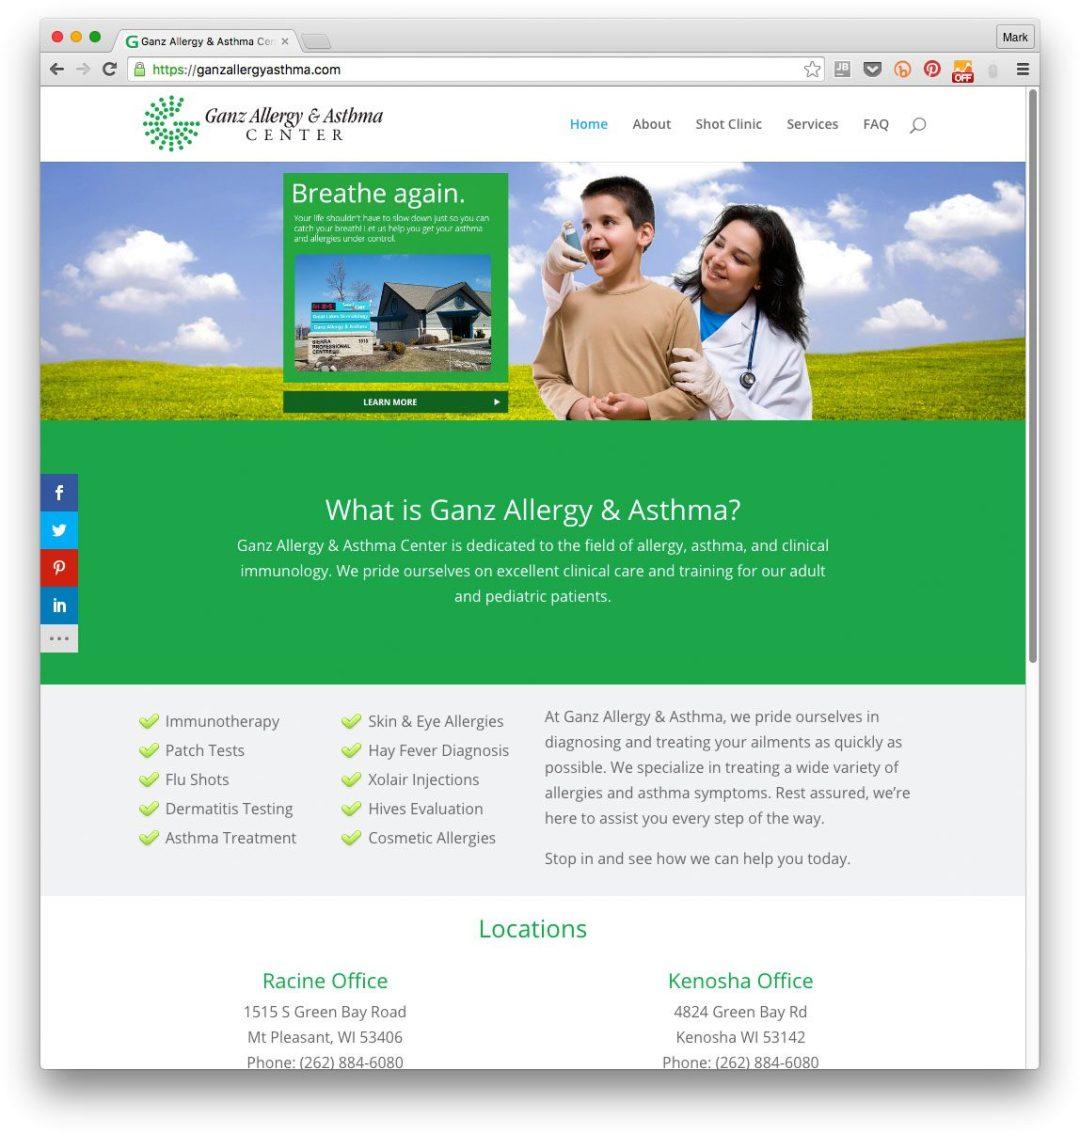 Ganz Allergy & Asthma Center website